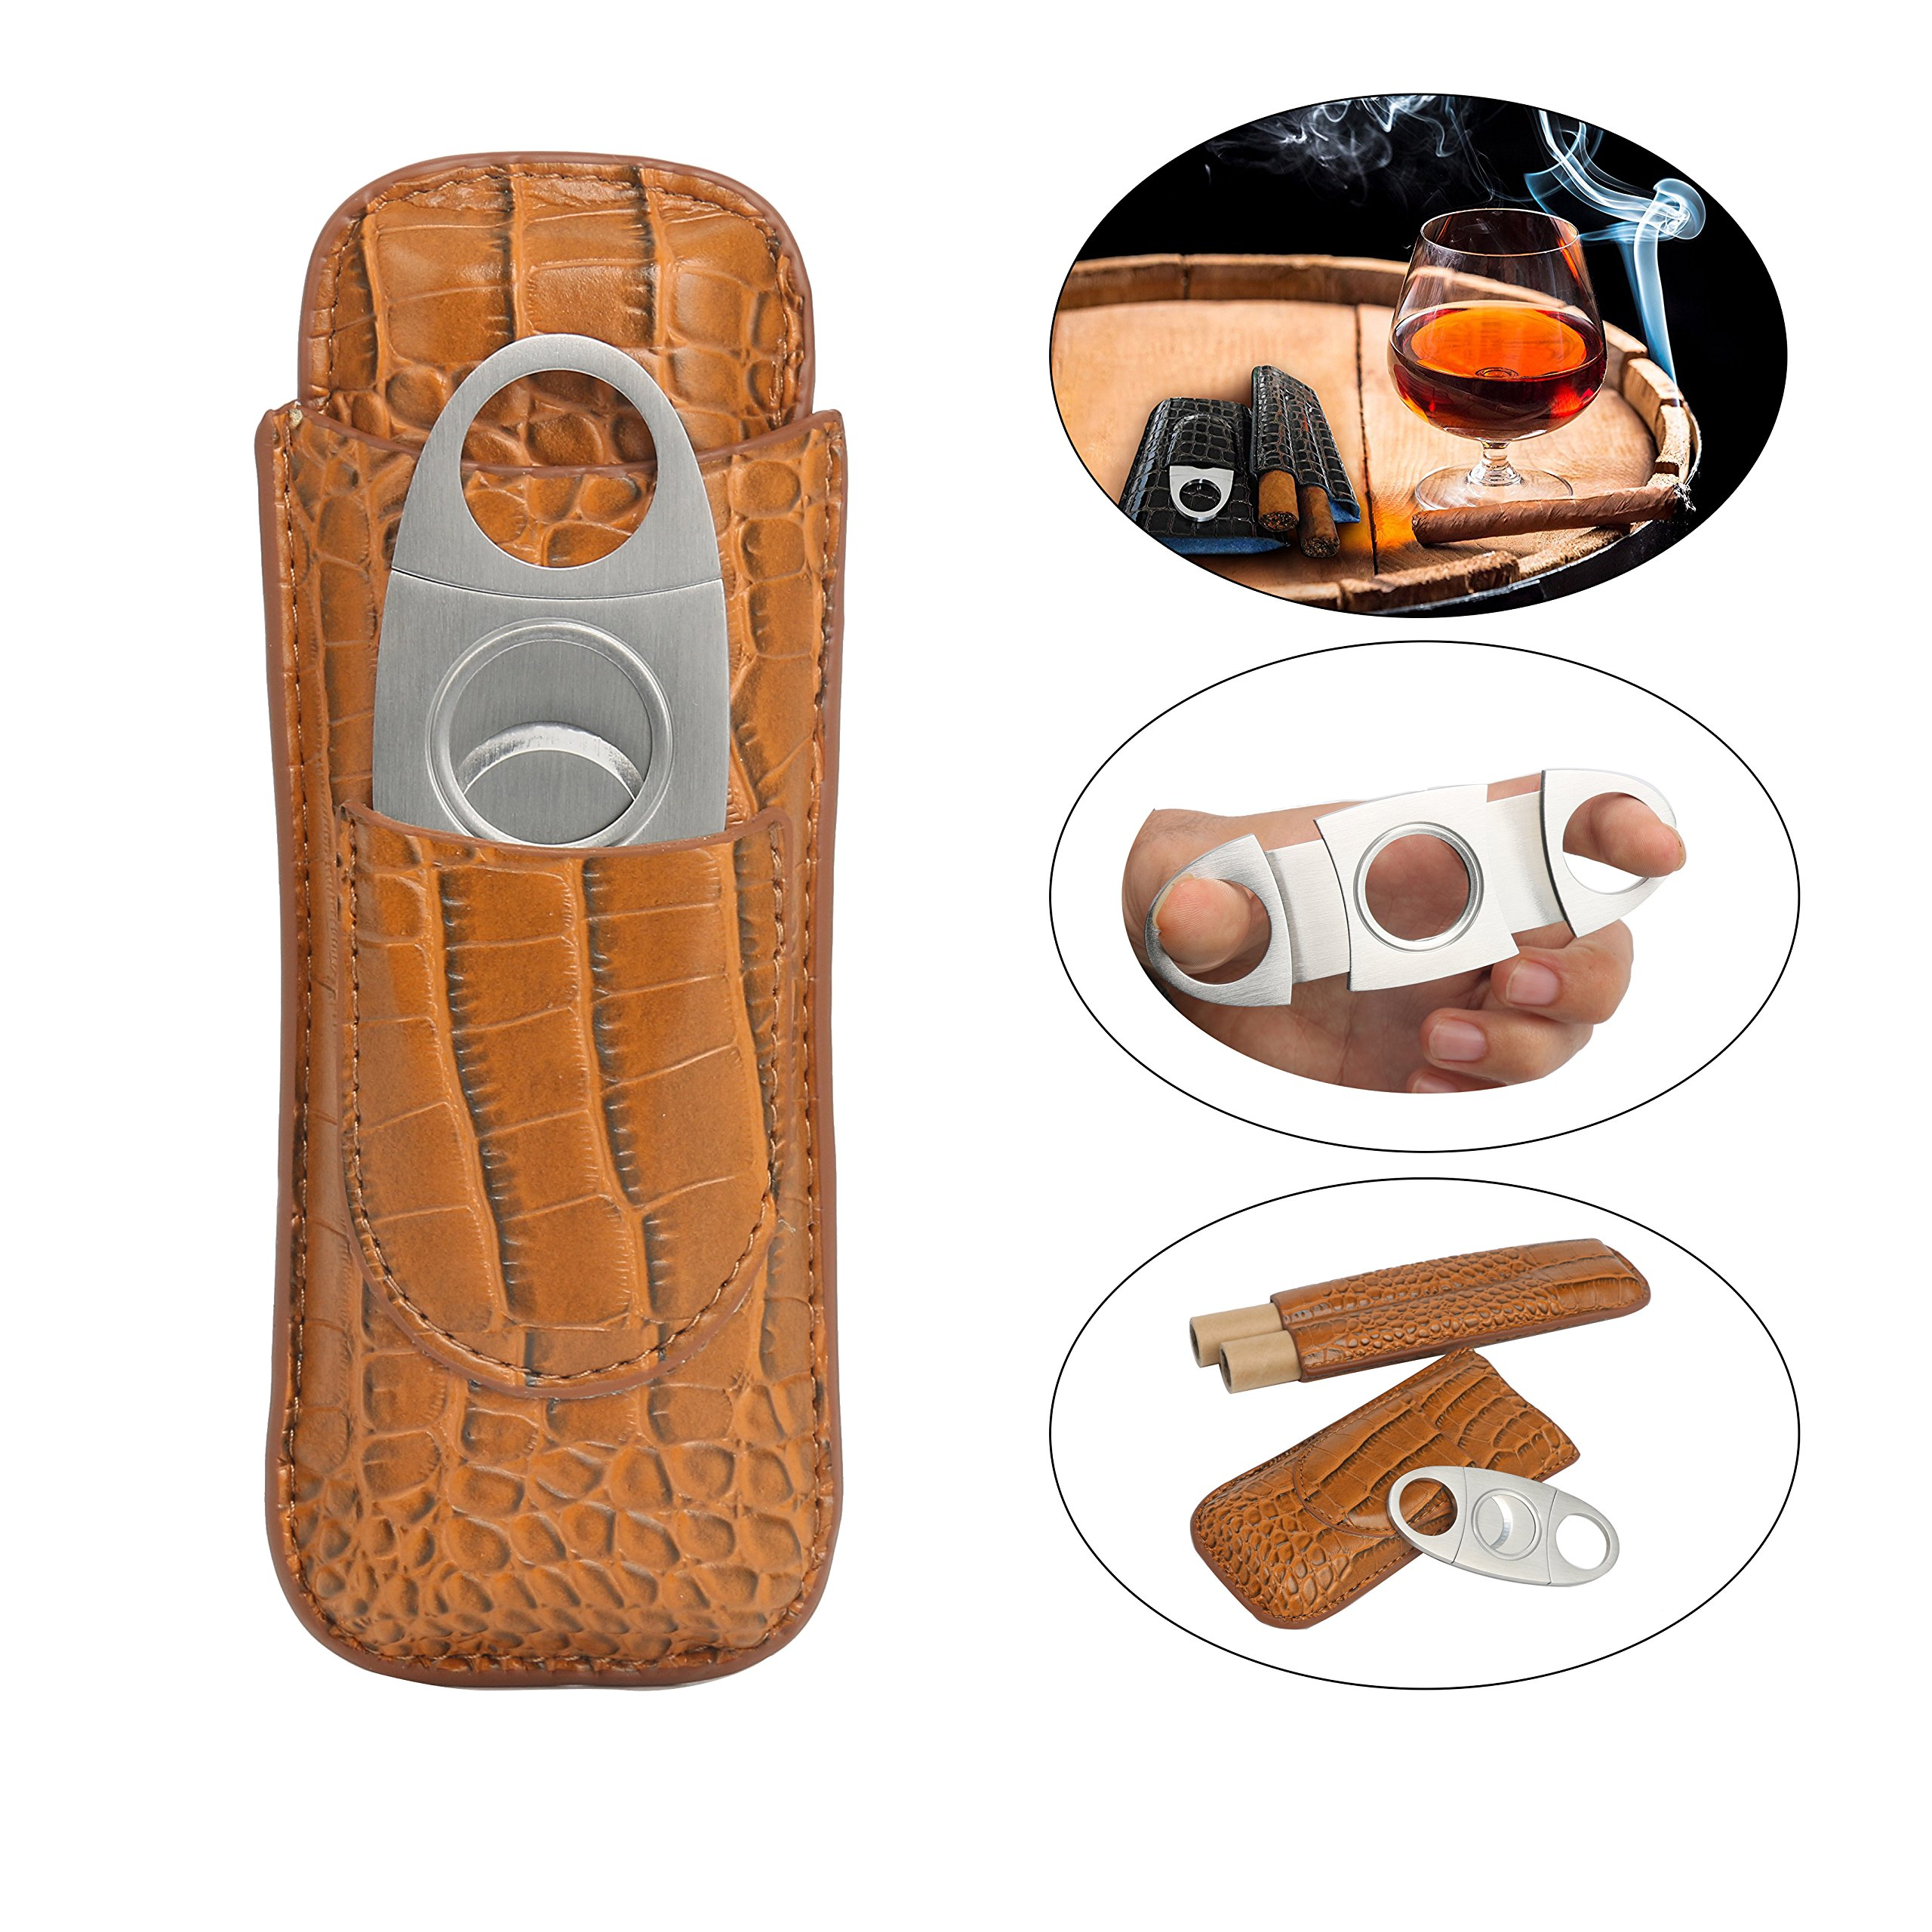 YaeTek Cigar Case Travel,Cutter Included,Leather Color Light Brown,2 Cigars